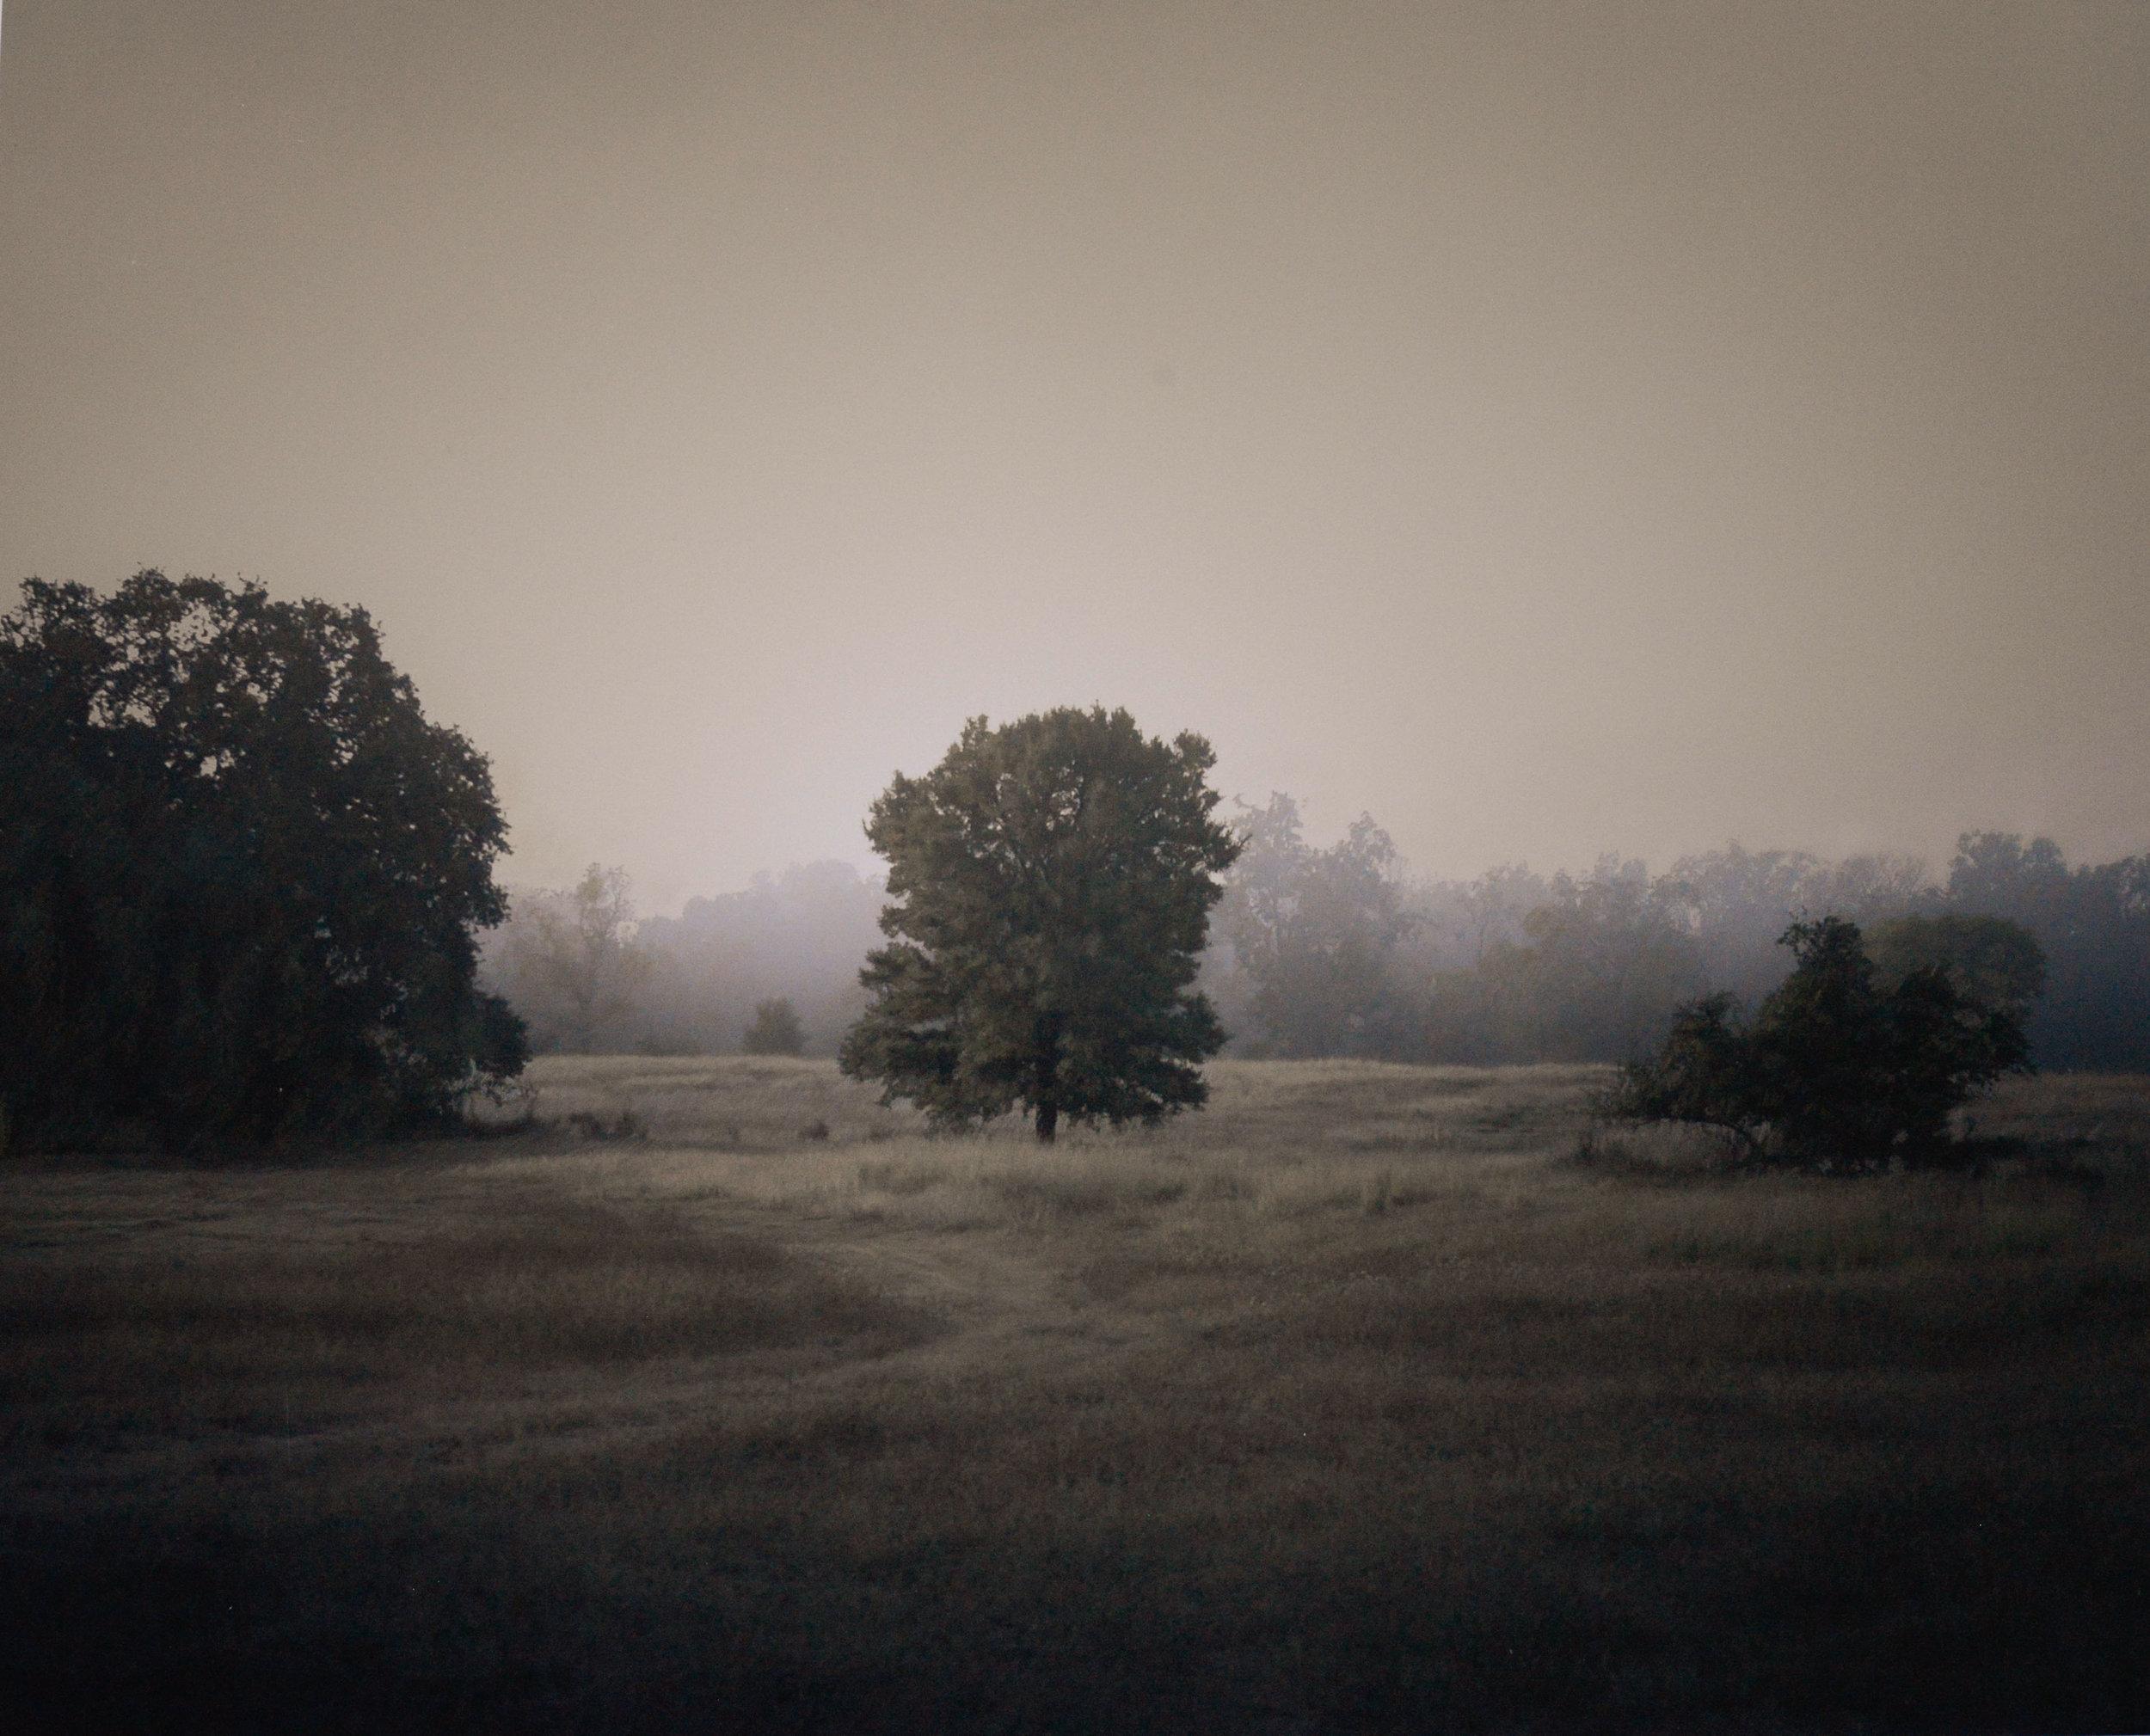 Trees in mist Plum Creek Texas